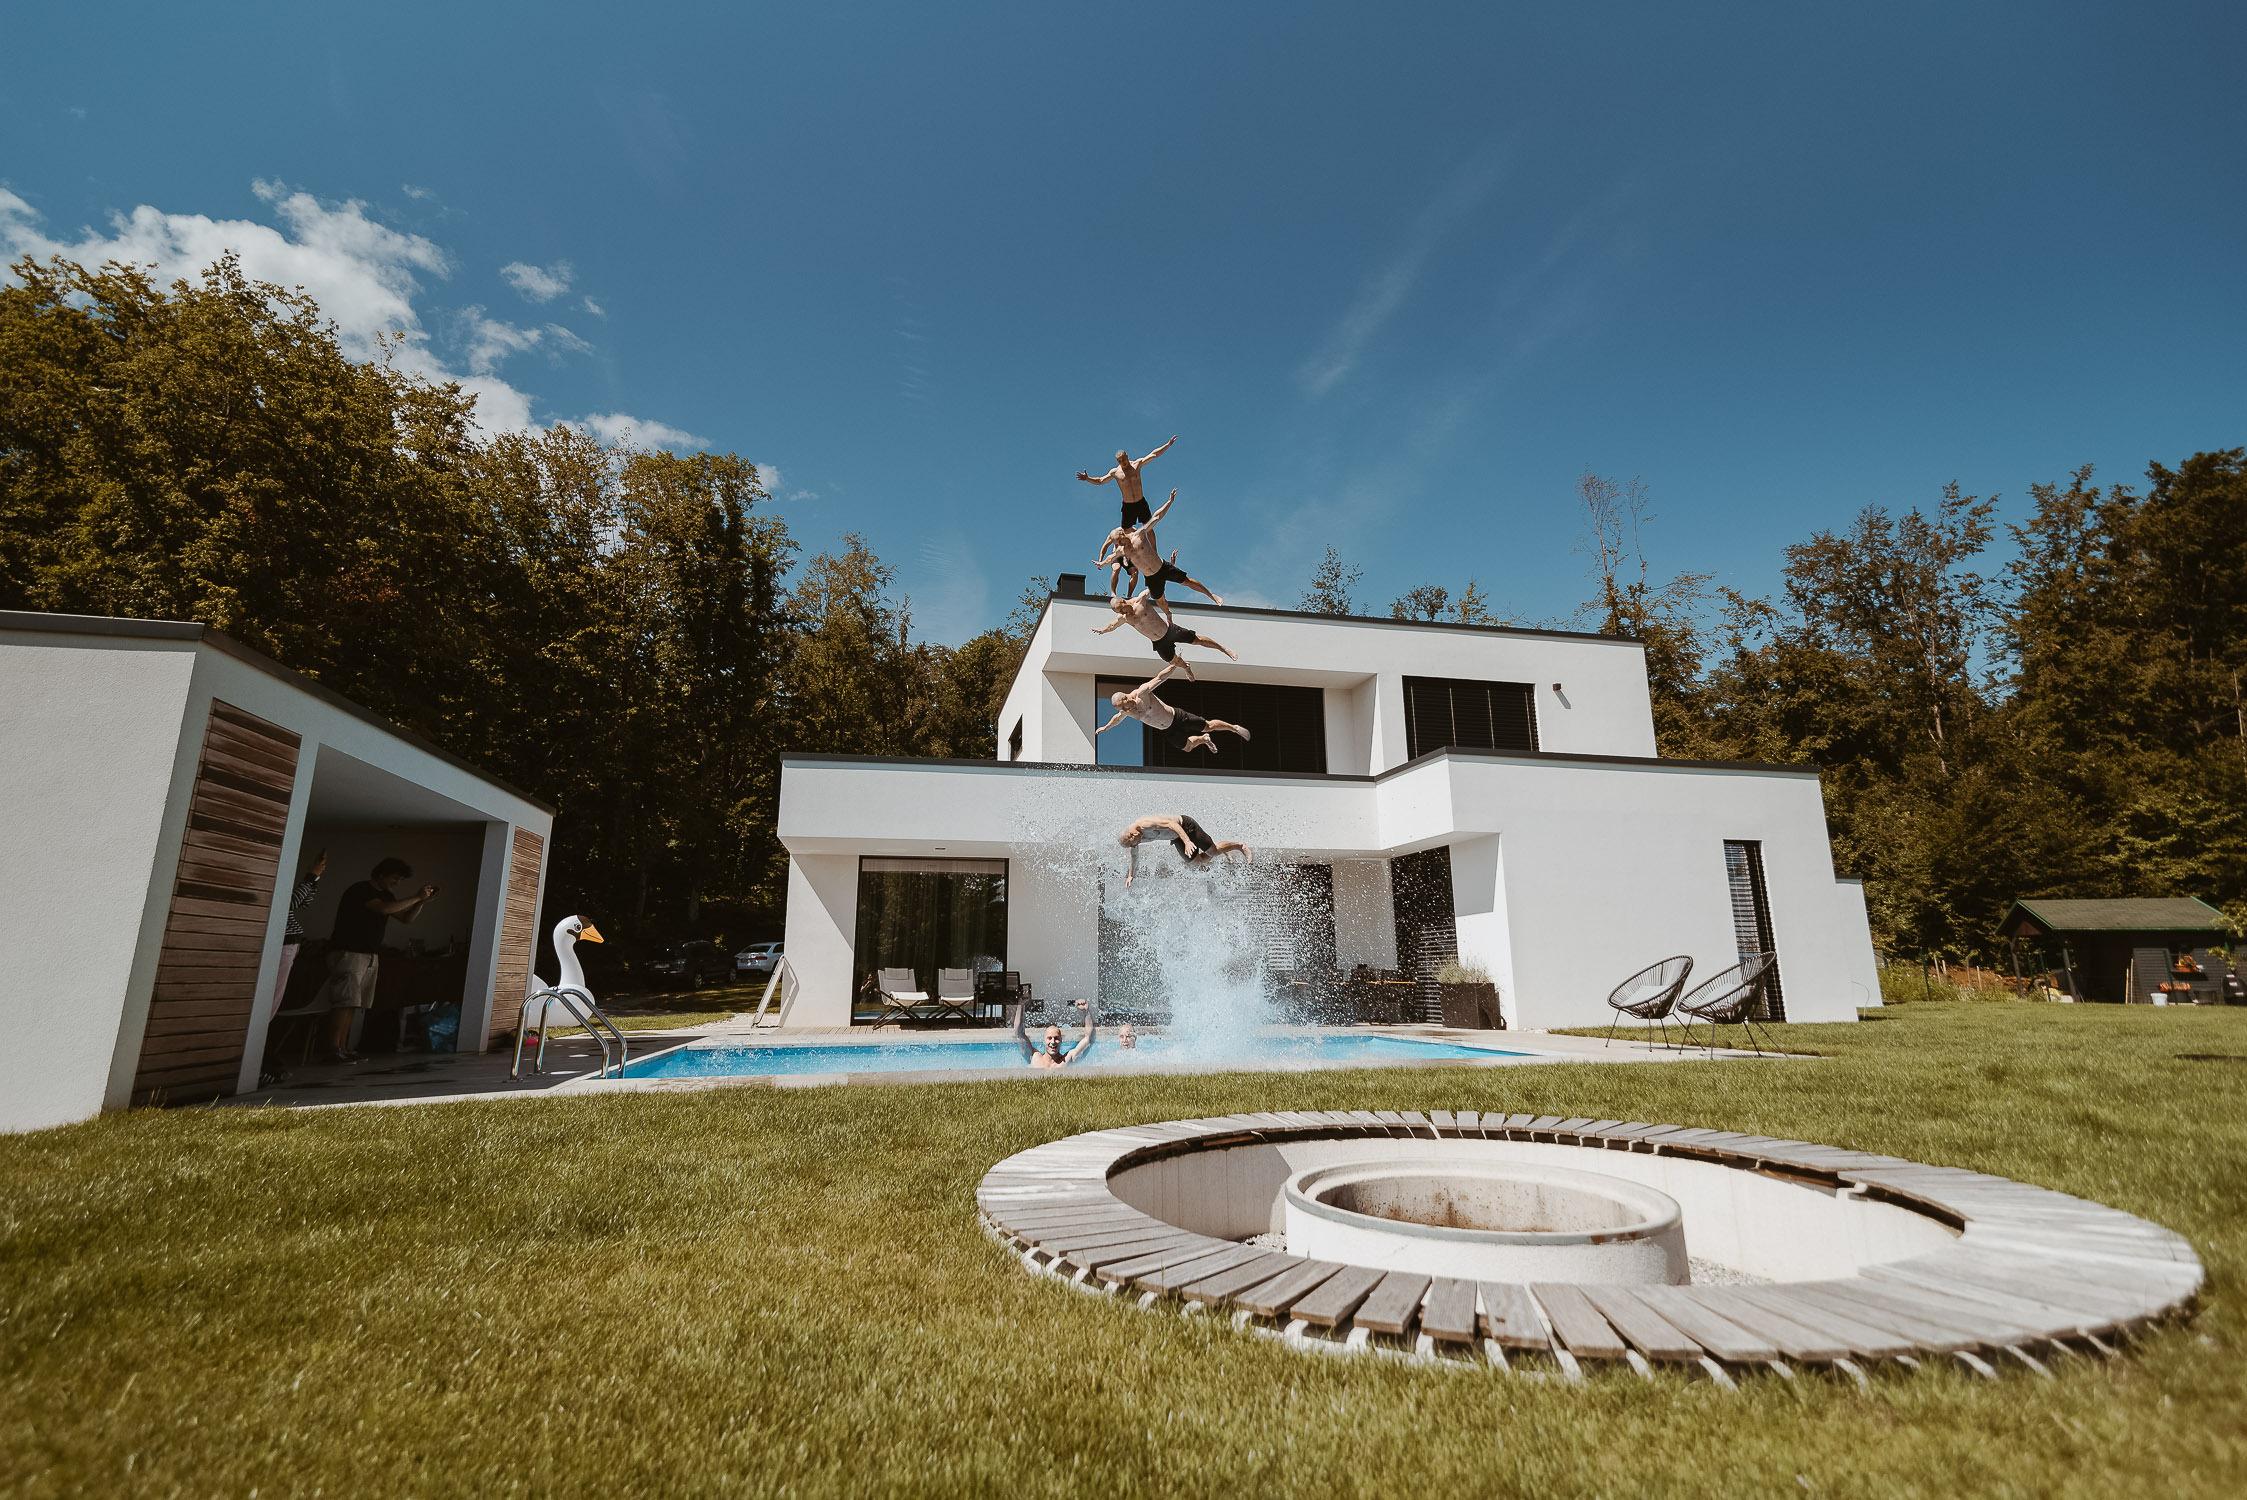 20180626 FB Acrobatics Dormeo Studio Moderna TK 35